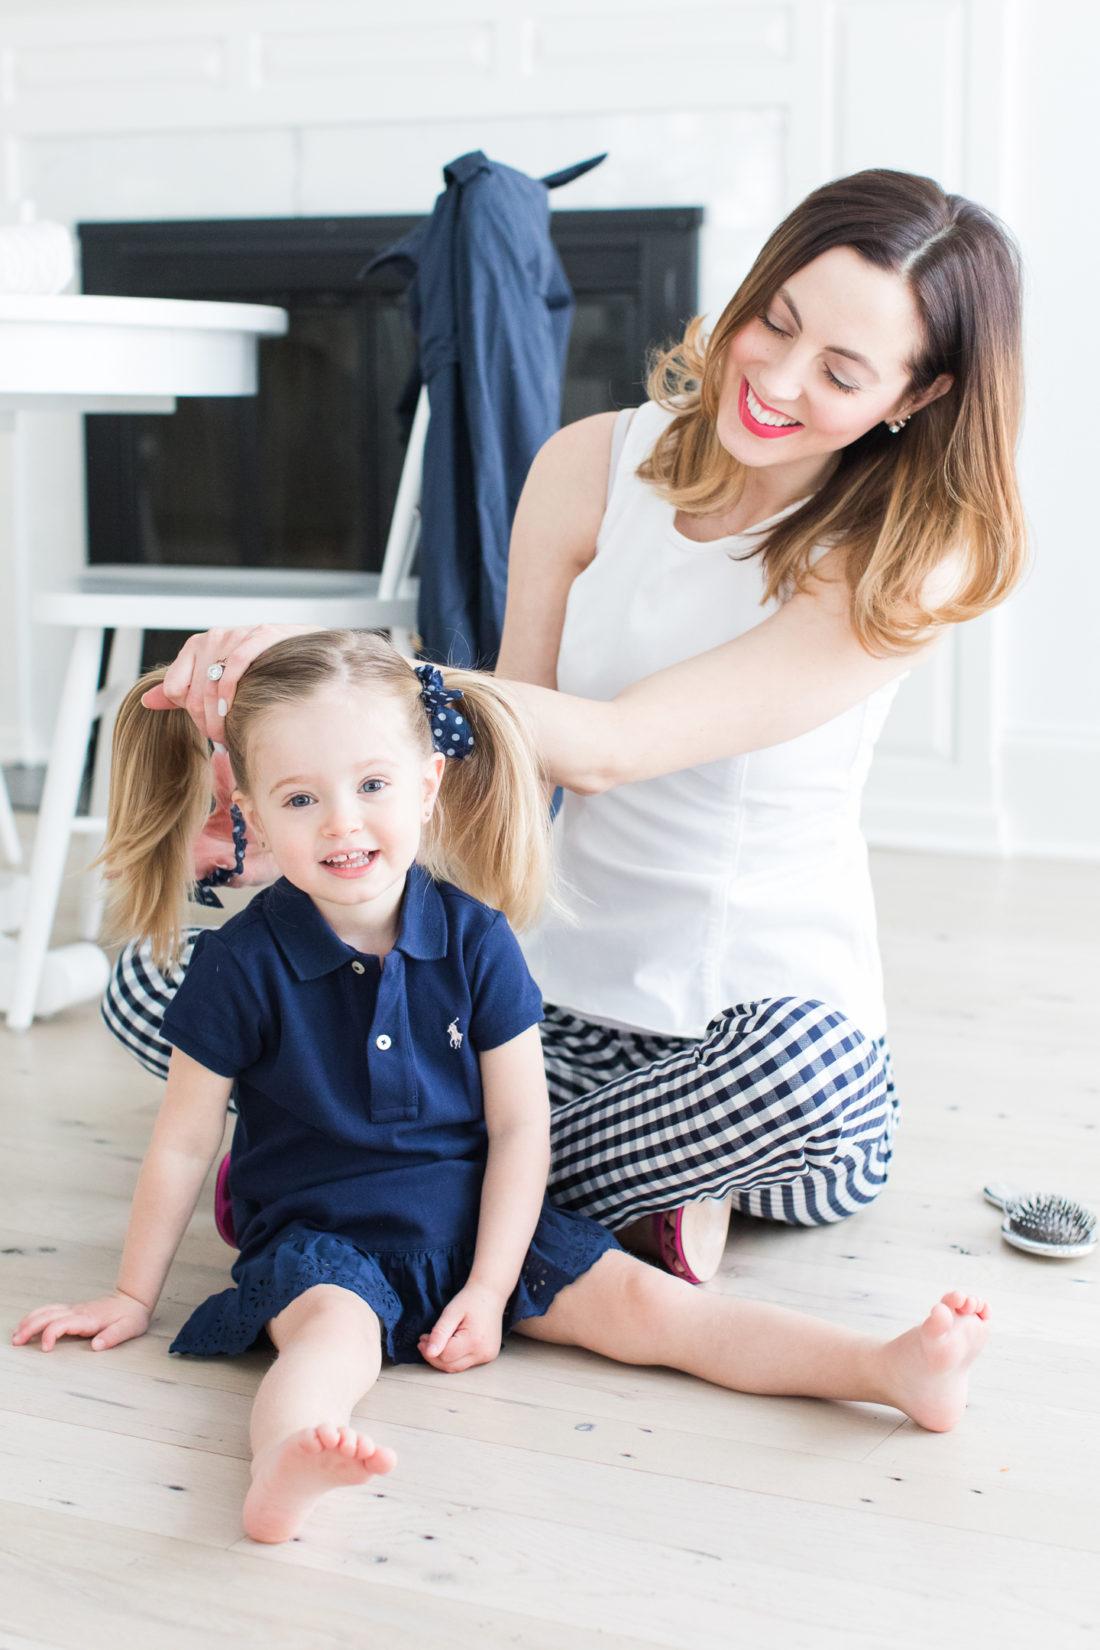 Eva Amurri Martino puts her daughter Marlowe's blonde hair in pigtails